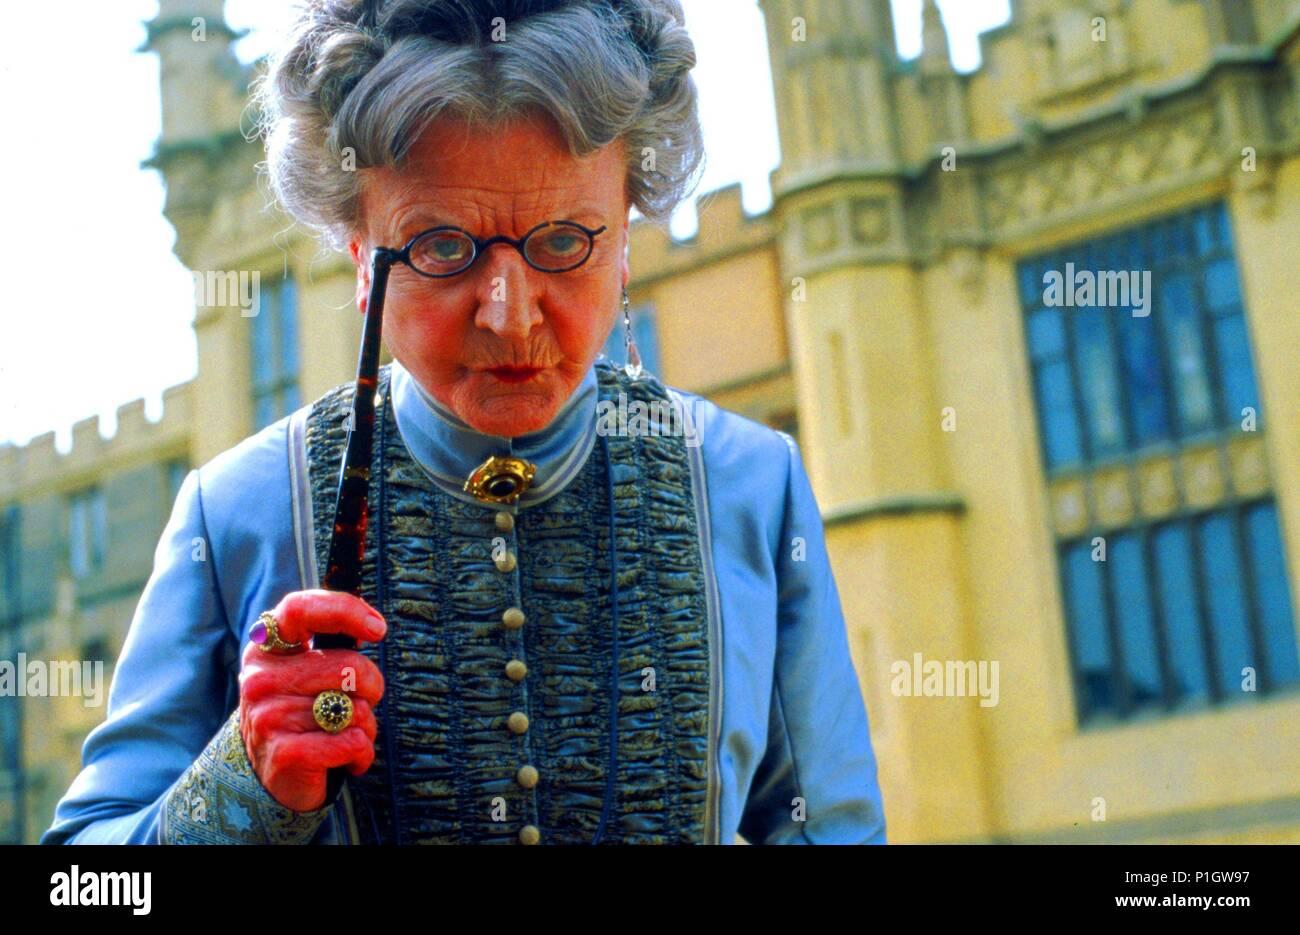 Nanny Mcphee Actores